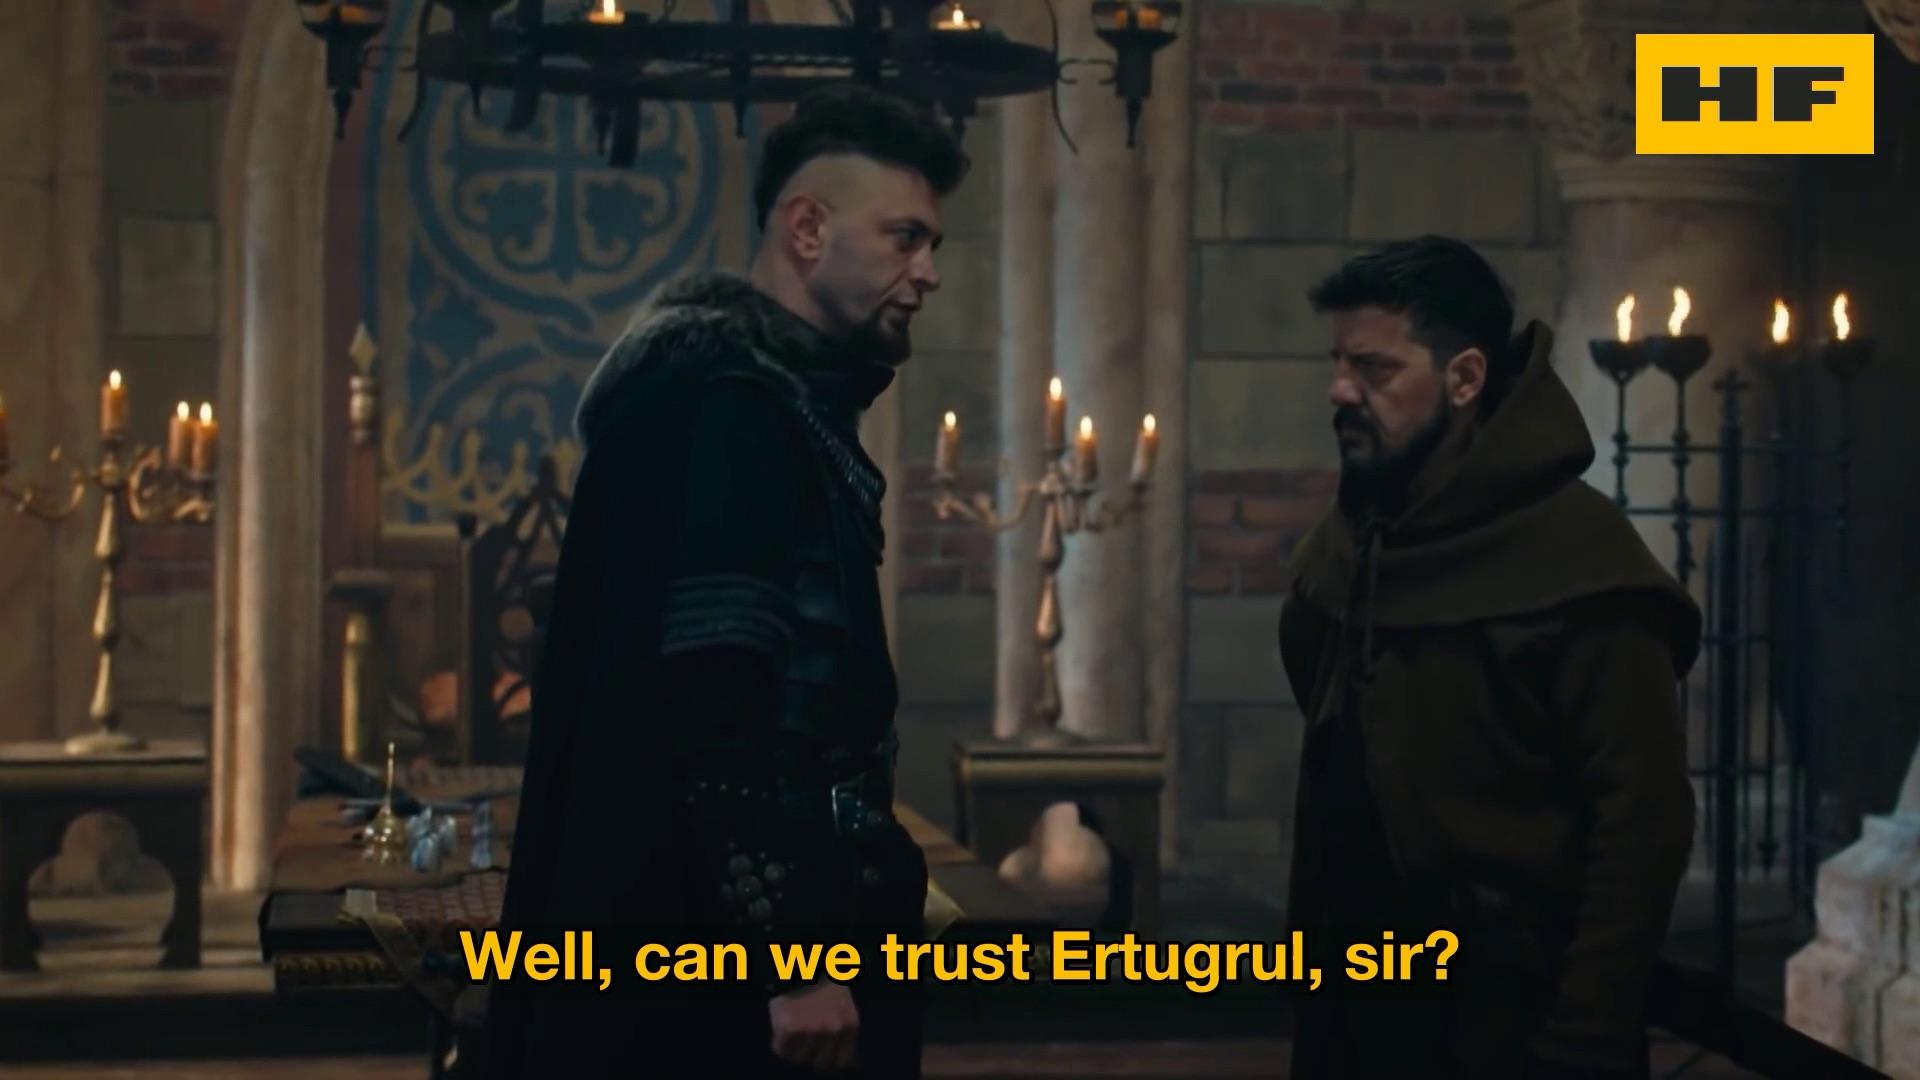 Release of Dirilis Ertugrul season 5 episode 10 - Historical